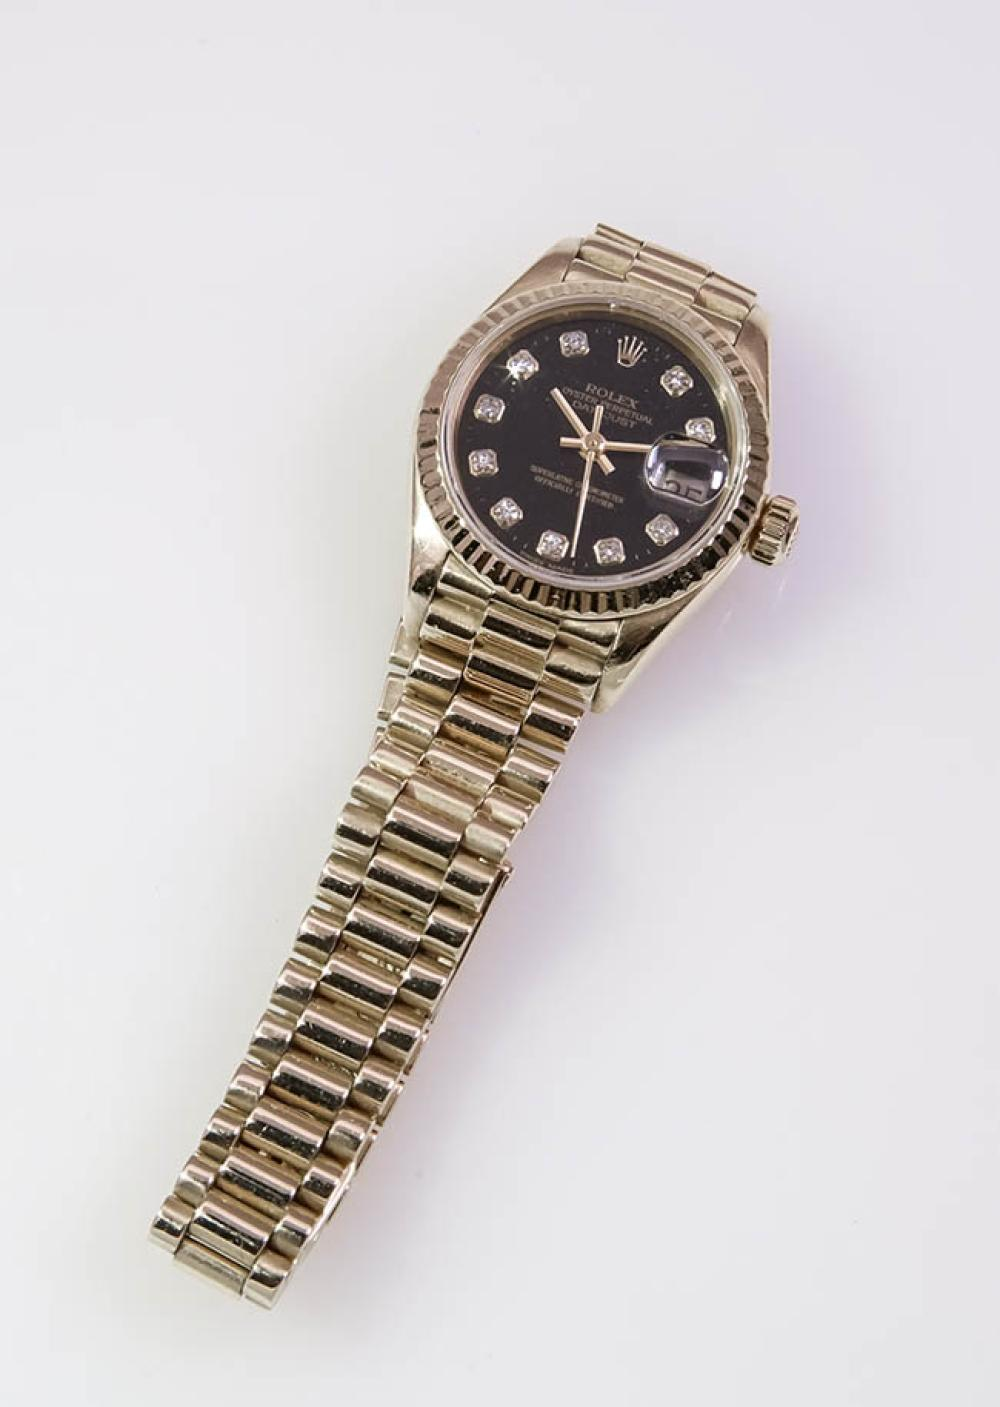 Lady's 18-Karat Yellow-Gold Automatic Wristwatch, Rolex, Oyster Perpetual, Datejust, Swiss